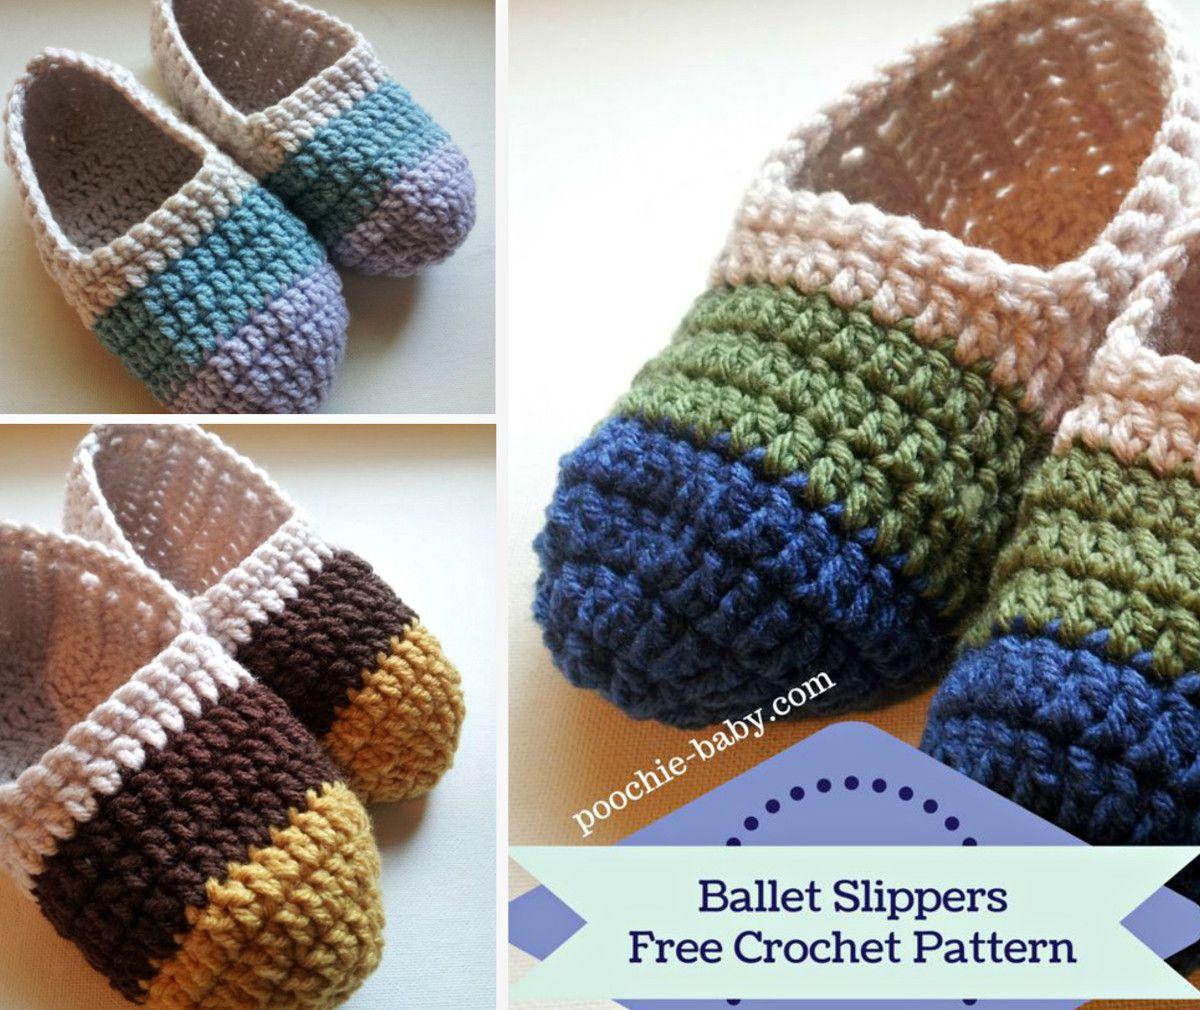 Crochet Loafer Slipper Pattern | Loafer slippers, Free pattern and ...